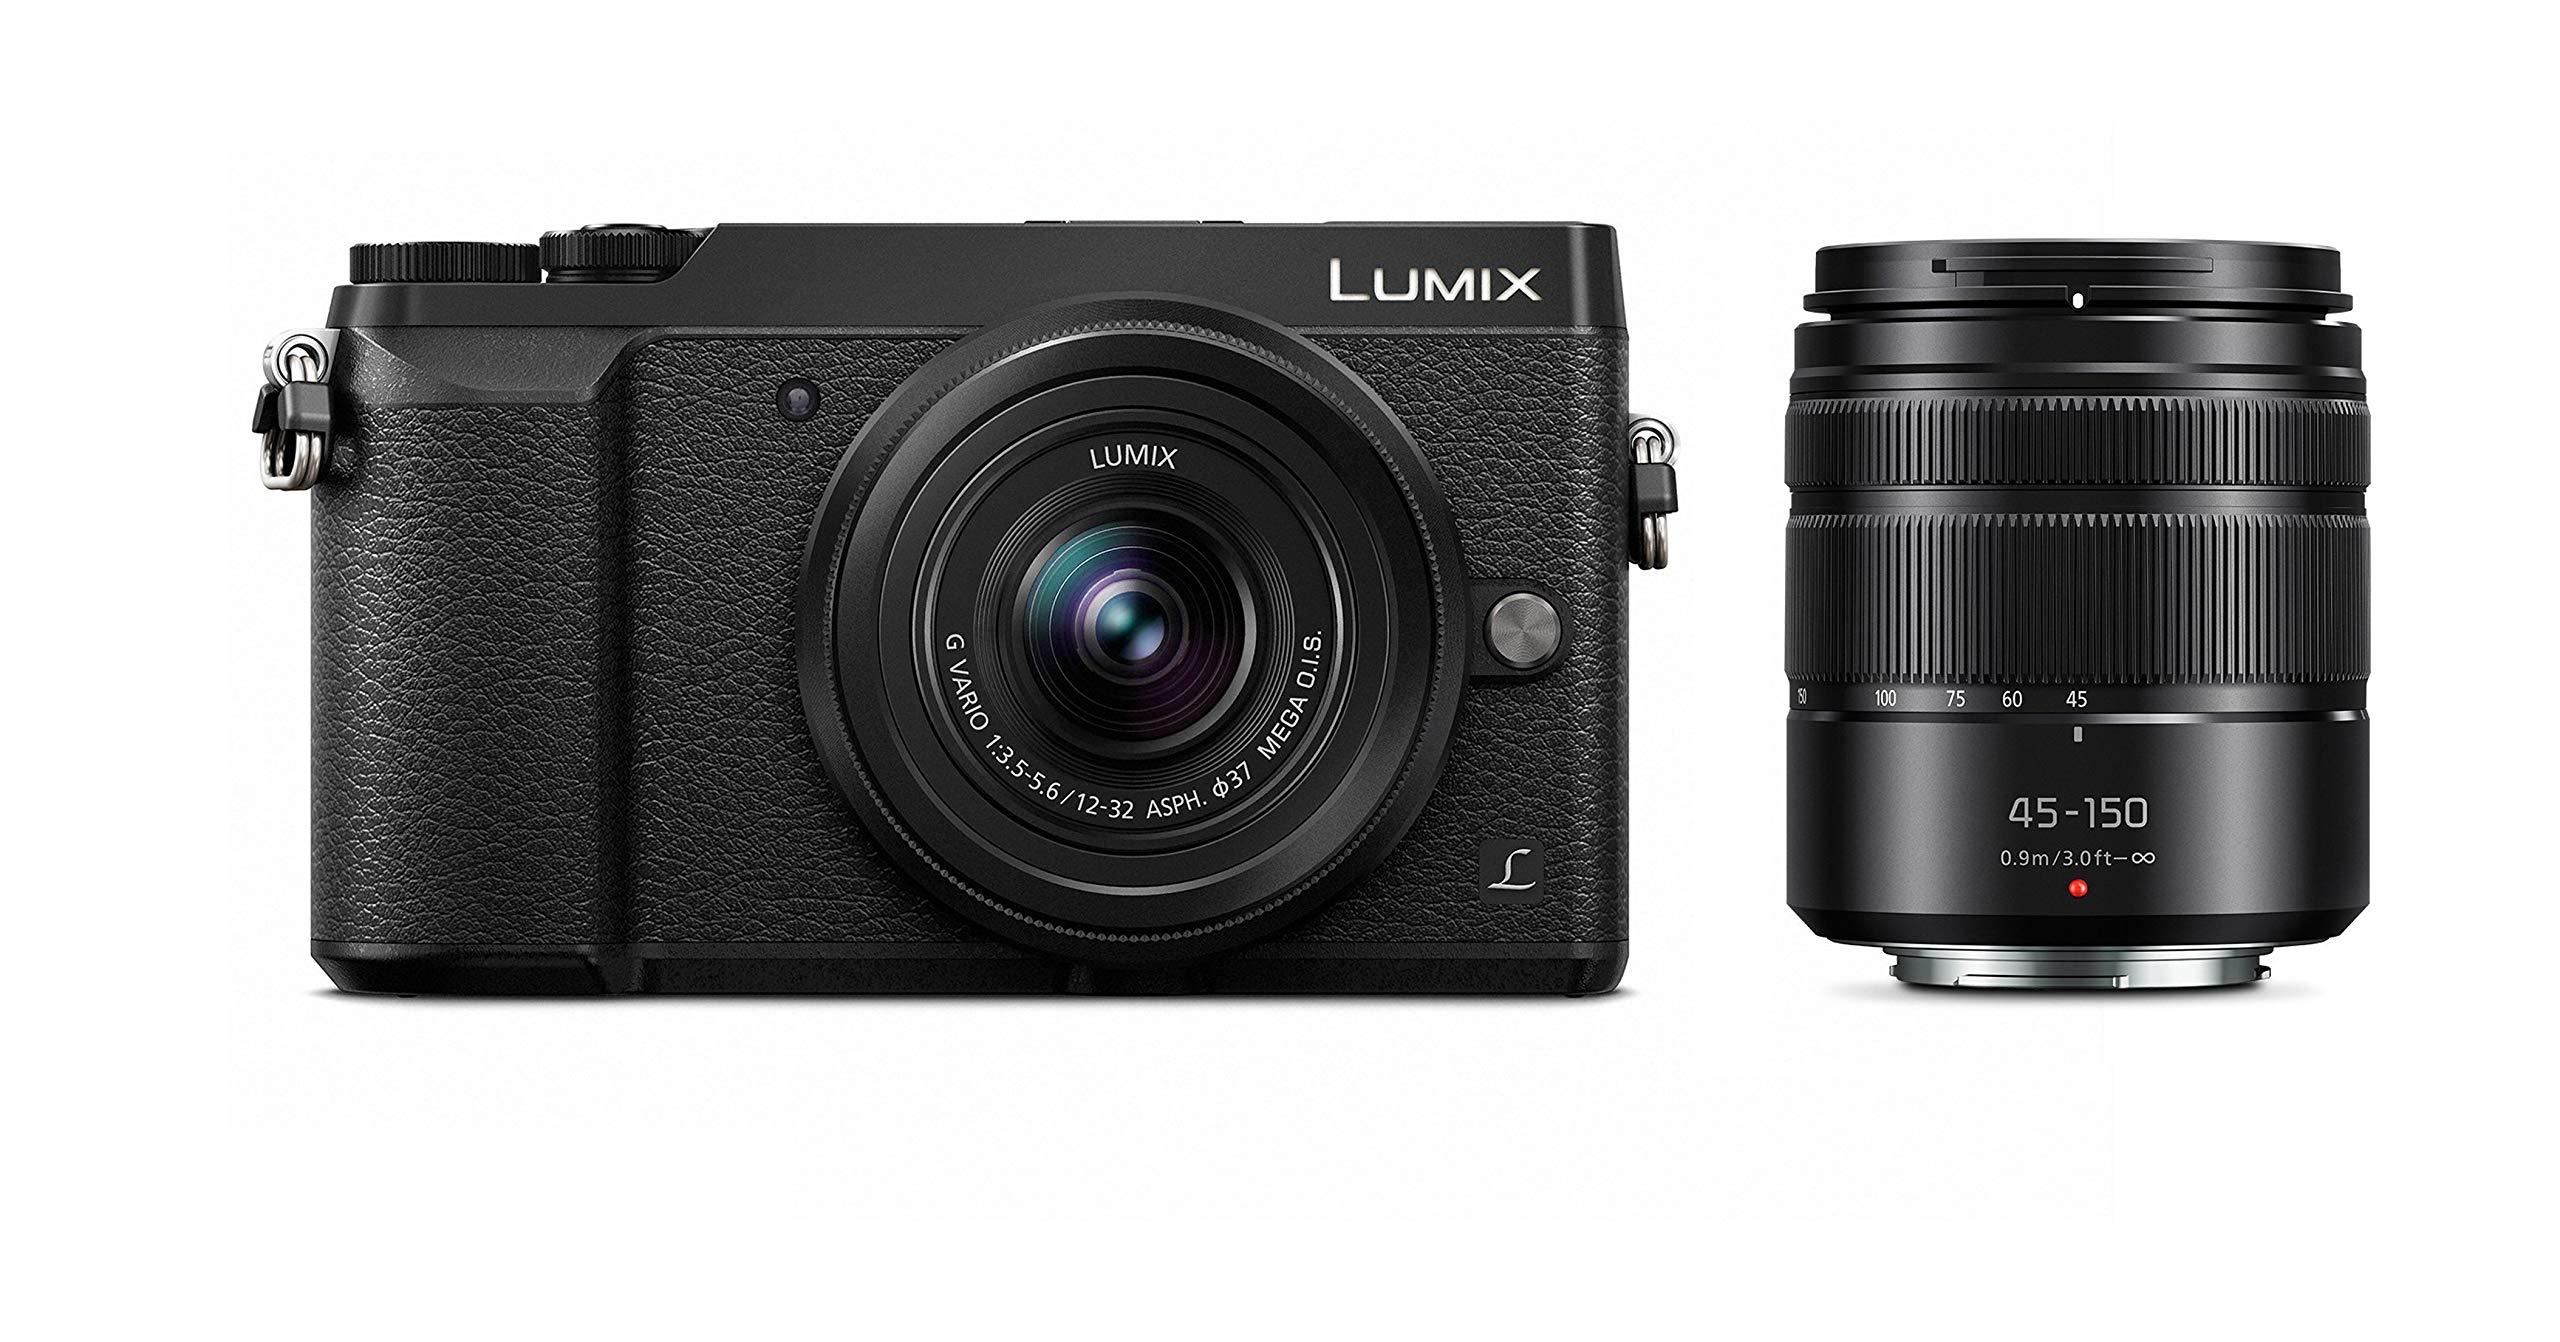 PANASONIC LUMIX GX85 4K Digital Camera, 12-32mm and 45-150mm Lens Bundle, 16 Megapixel Mirrorless Camera Kit, 5 Axis in-Body Dual Image Stabilization, 3-Inch Tilt and Touch LCD, DMC-GX85WK (Black) by Panasonic